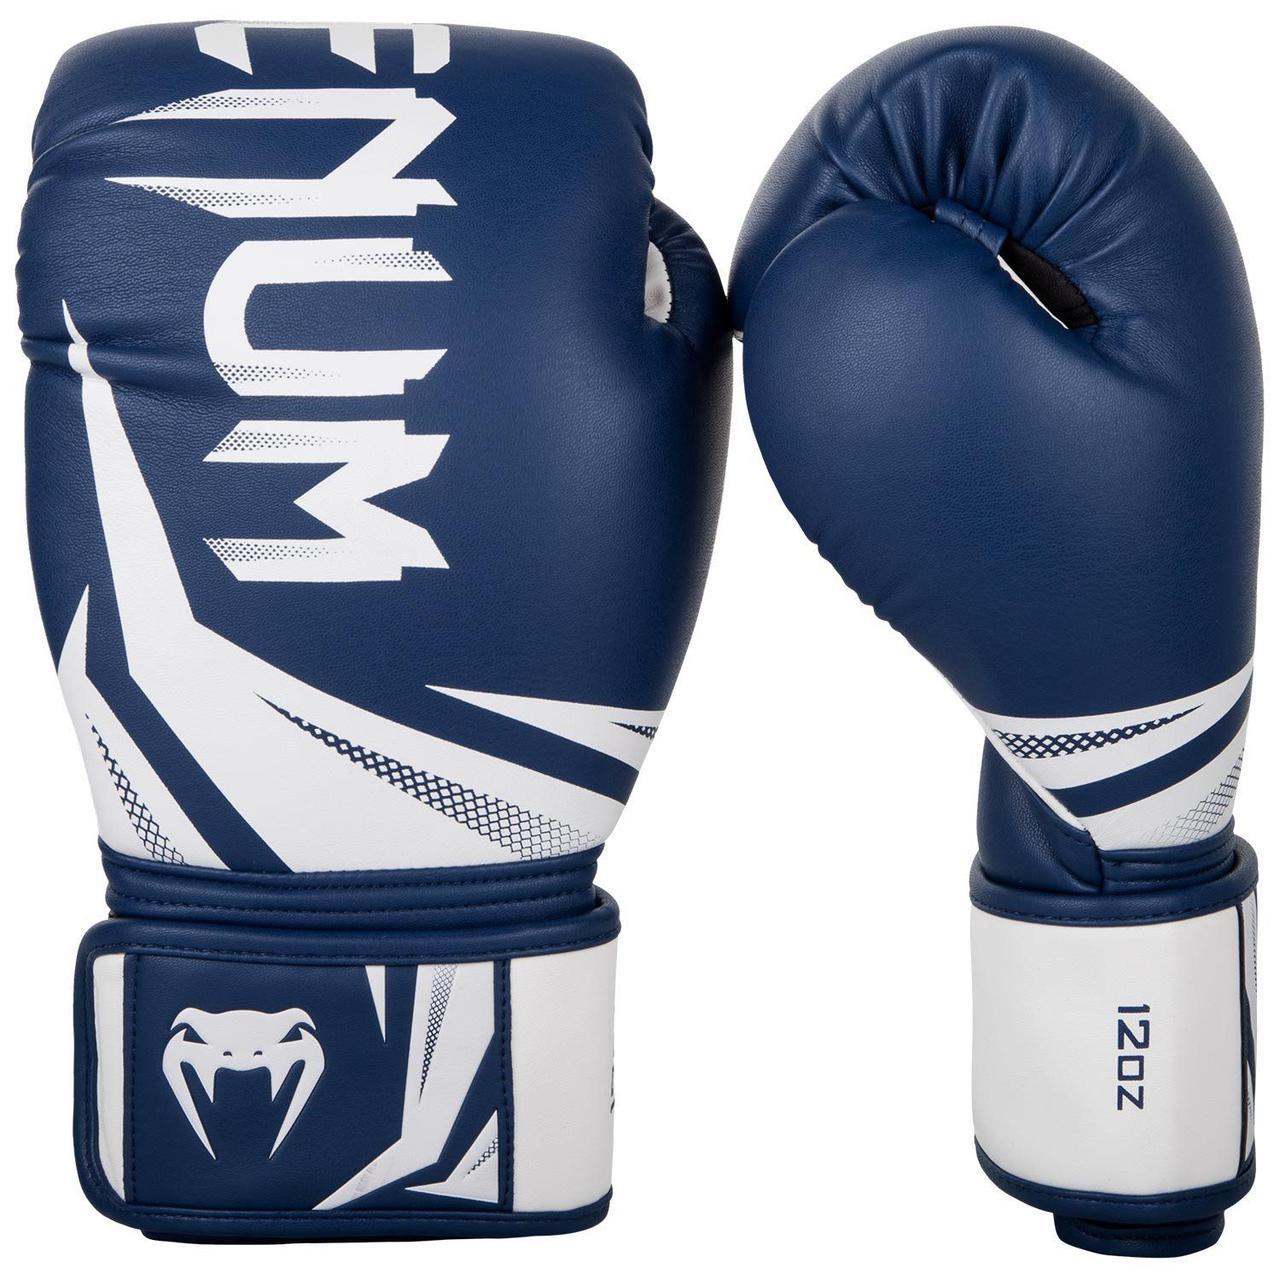 Боксерские перчатки Venum Challenger 3.0 Navy Blue/White